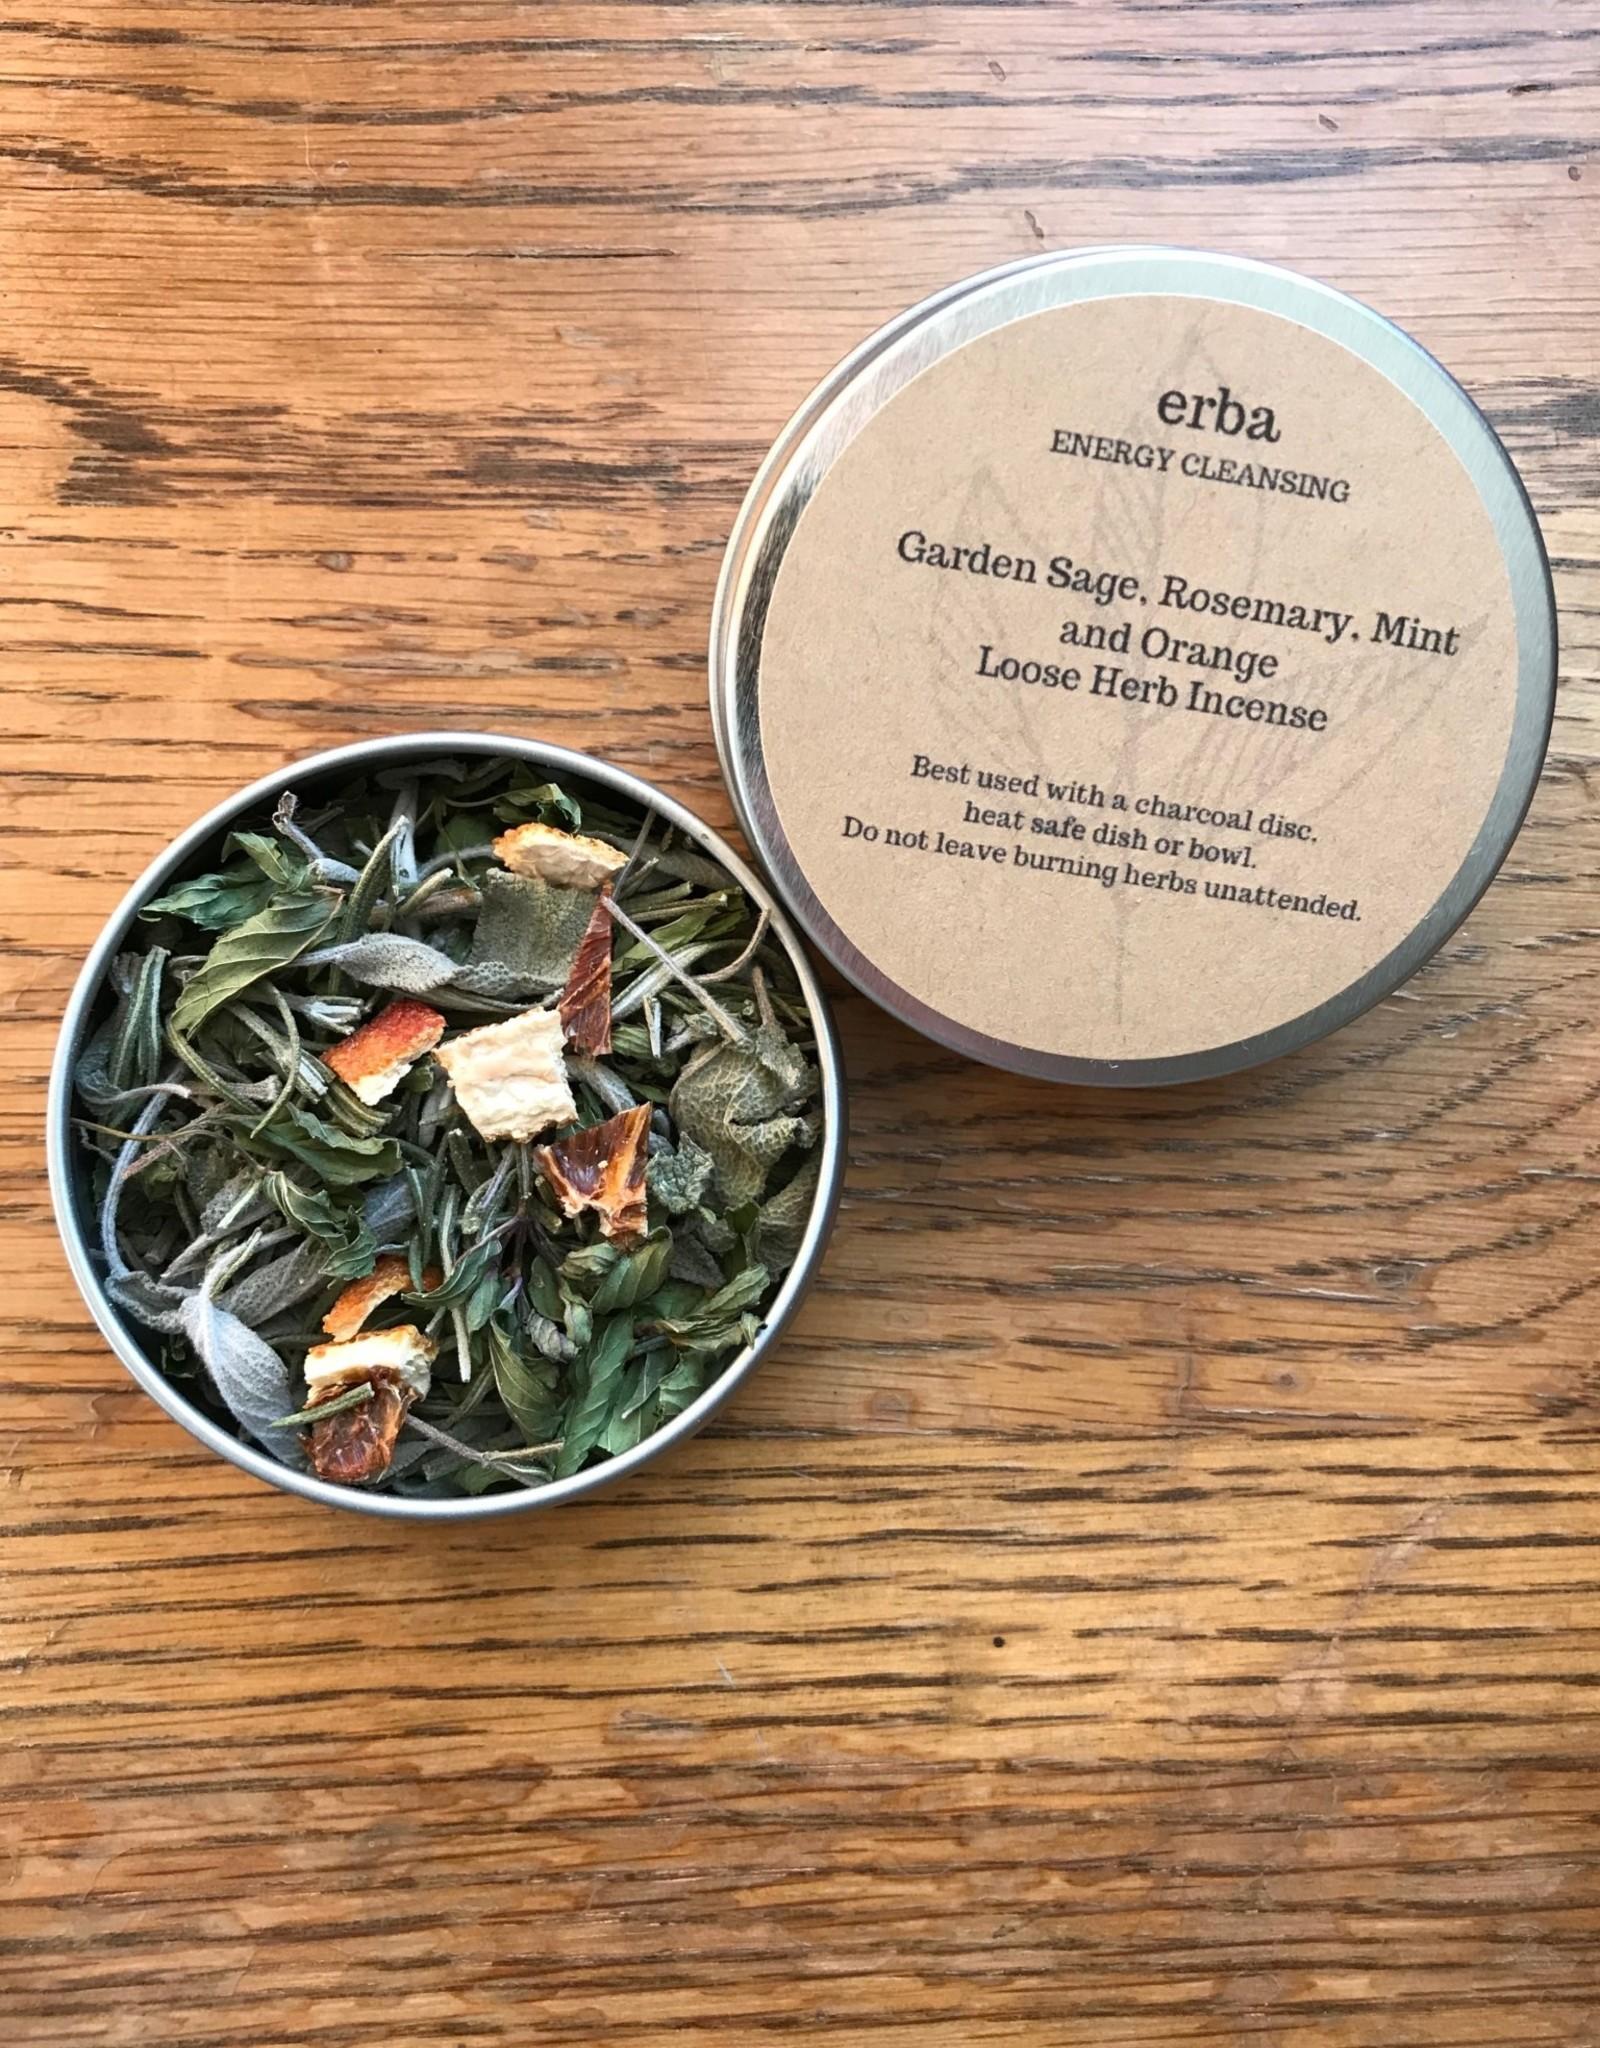 erba Garden Sage and Rosemary Loose Herb Incense